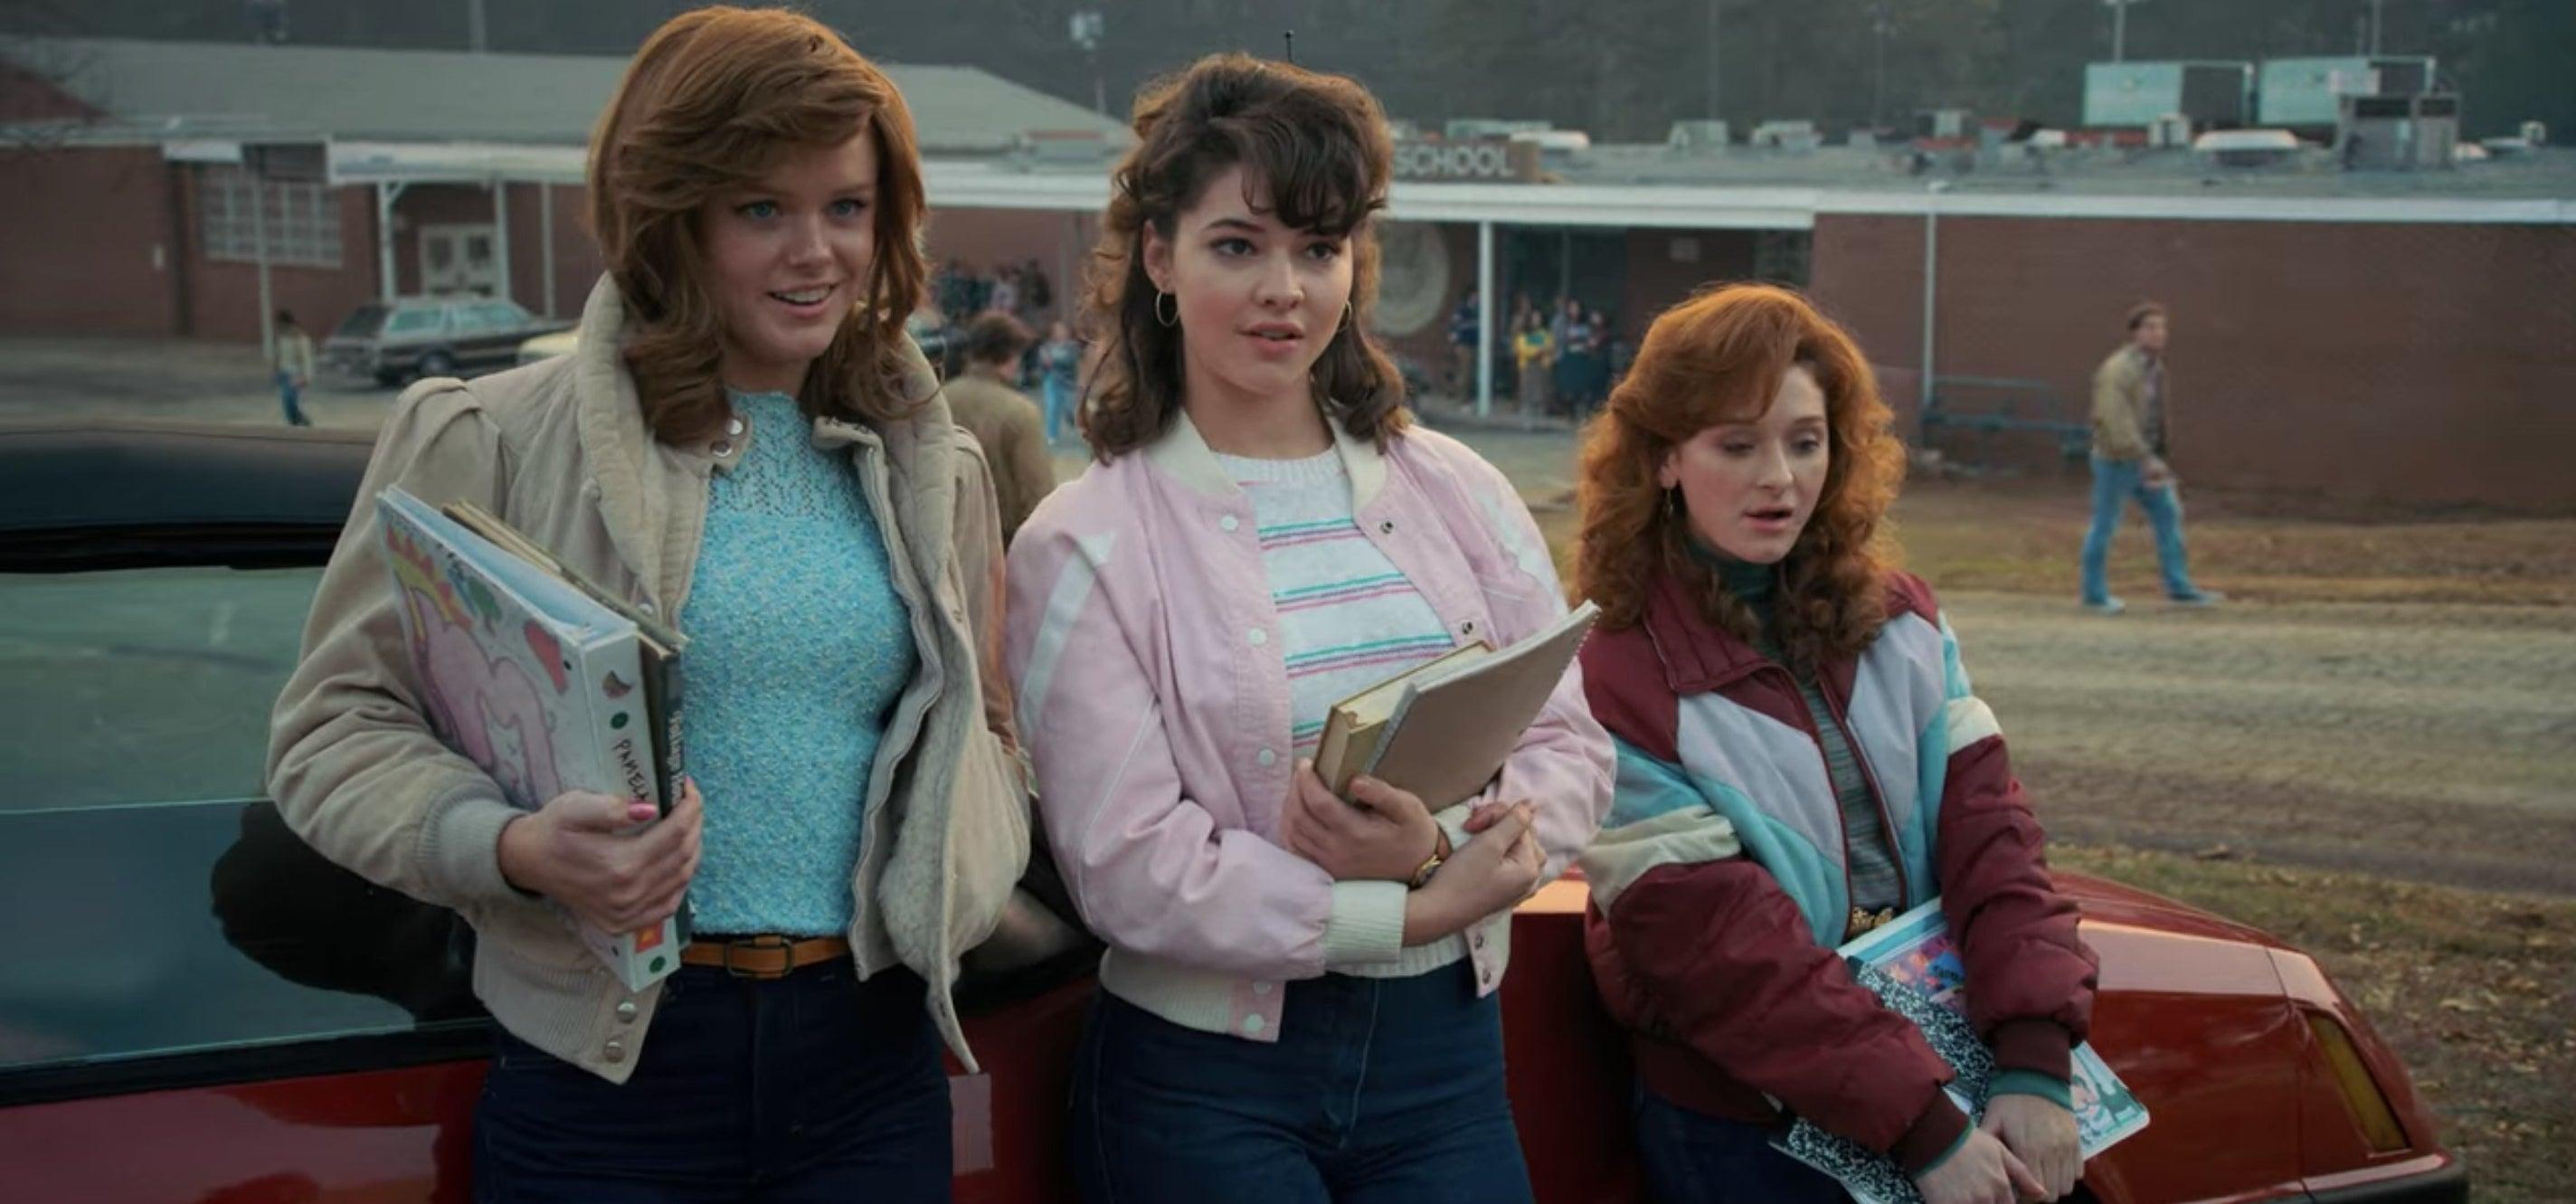 A group of girls in Stranger Things Season 2